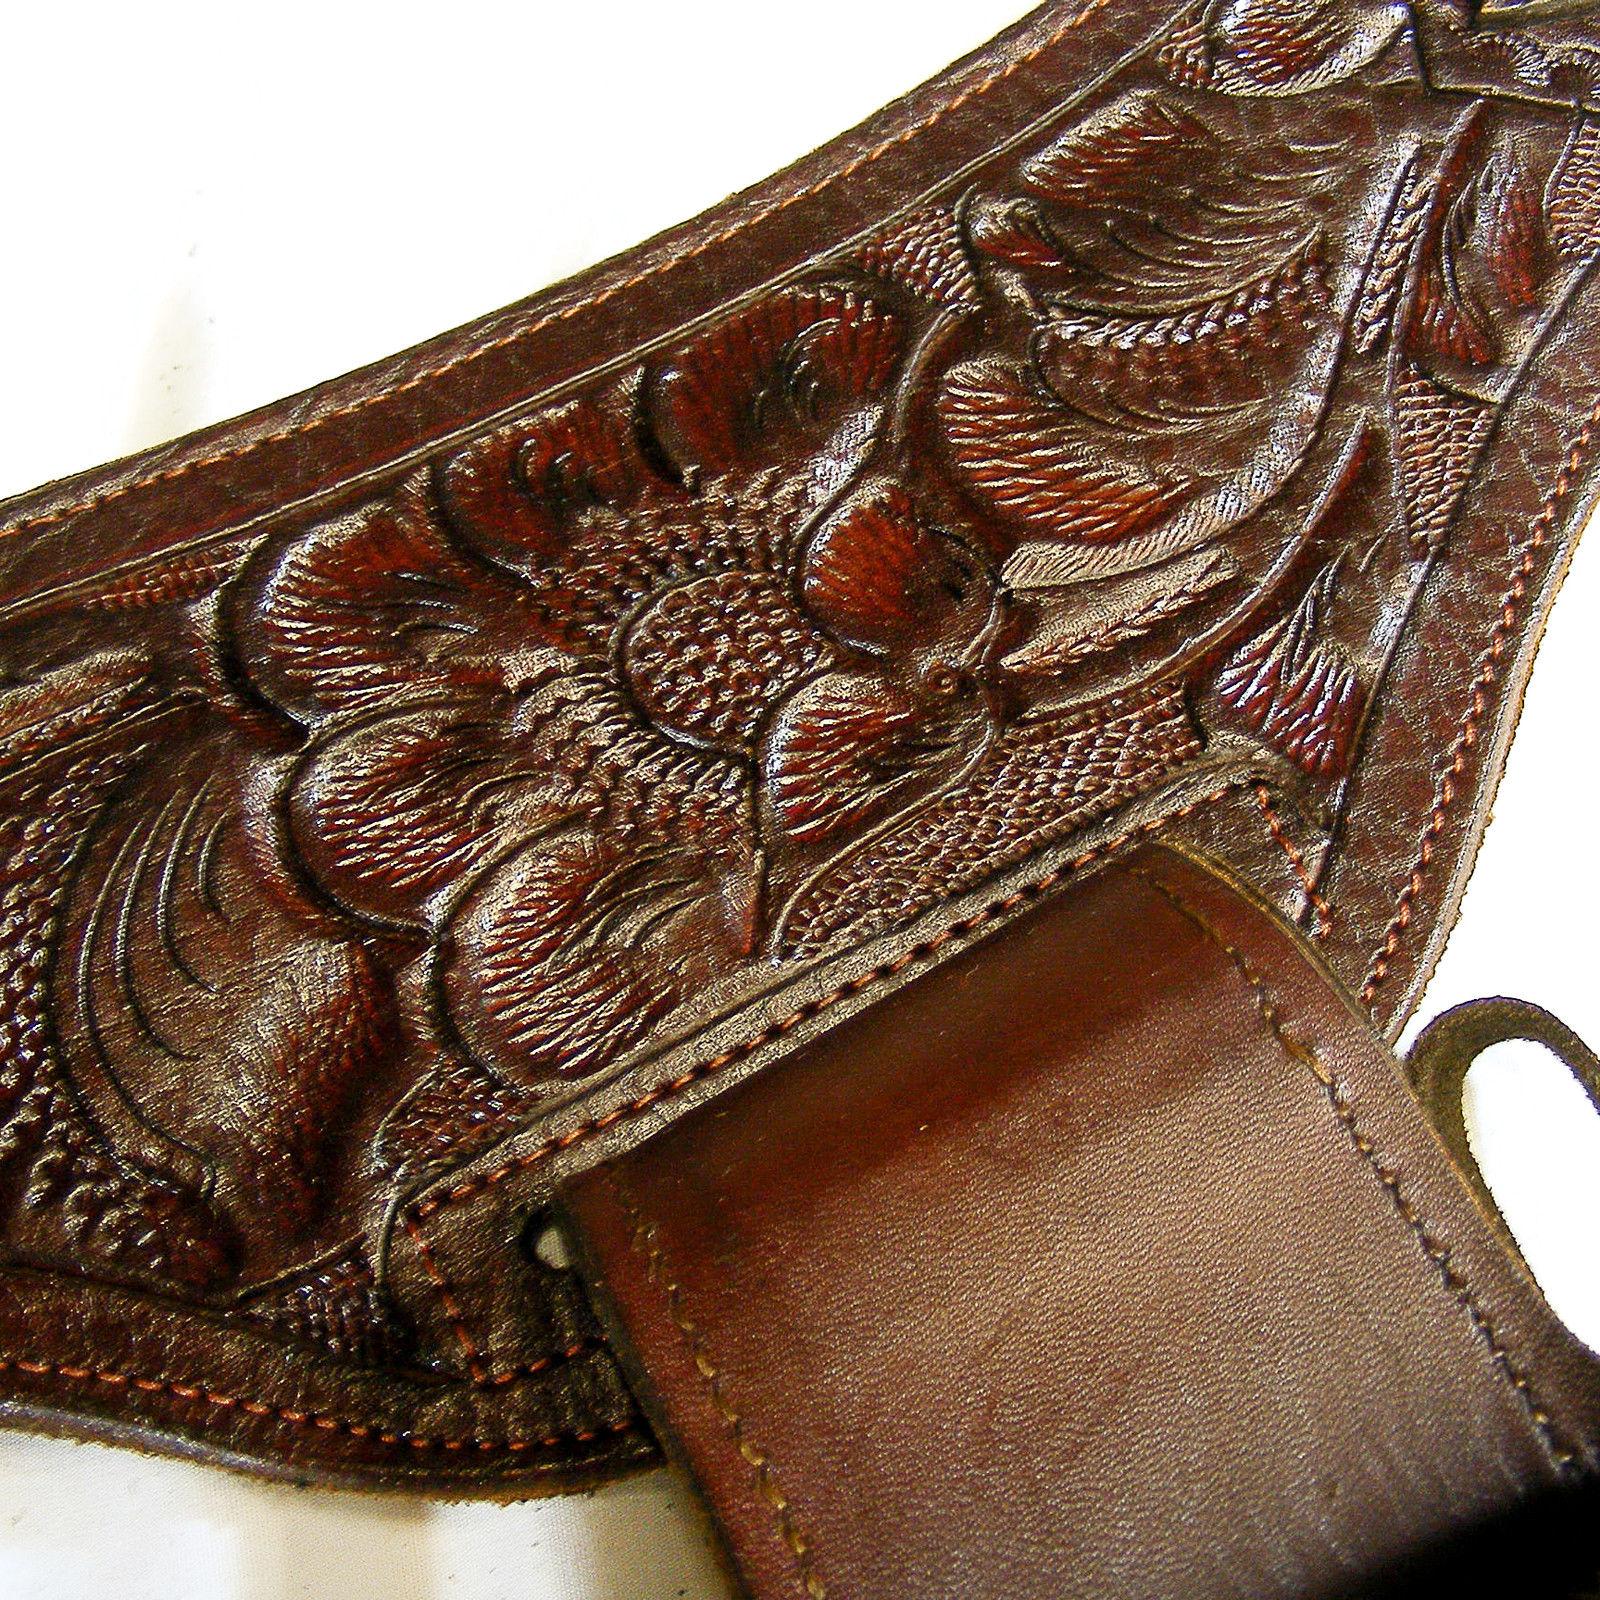 Western Cowboys Wallpaper Cowboy Gun Leather Holsters Wallpaper 1600x1600